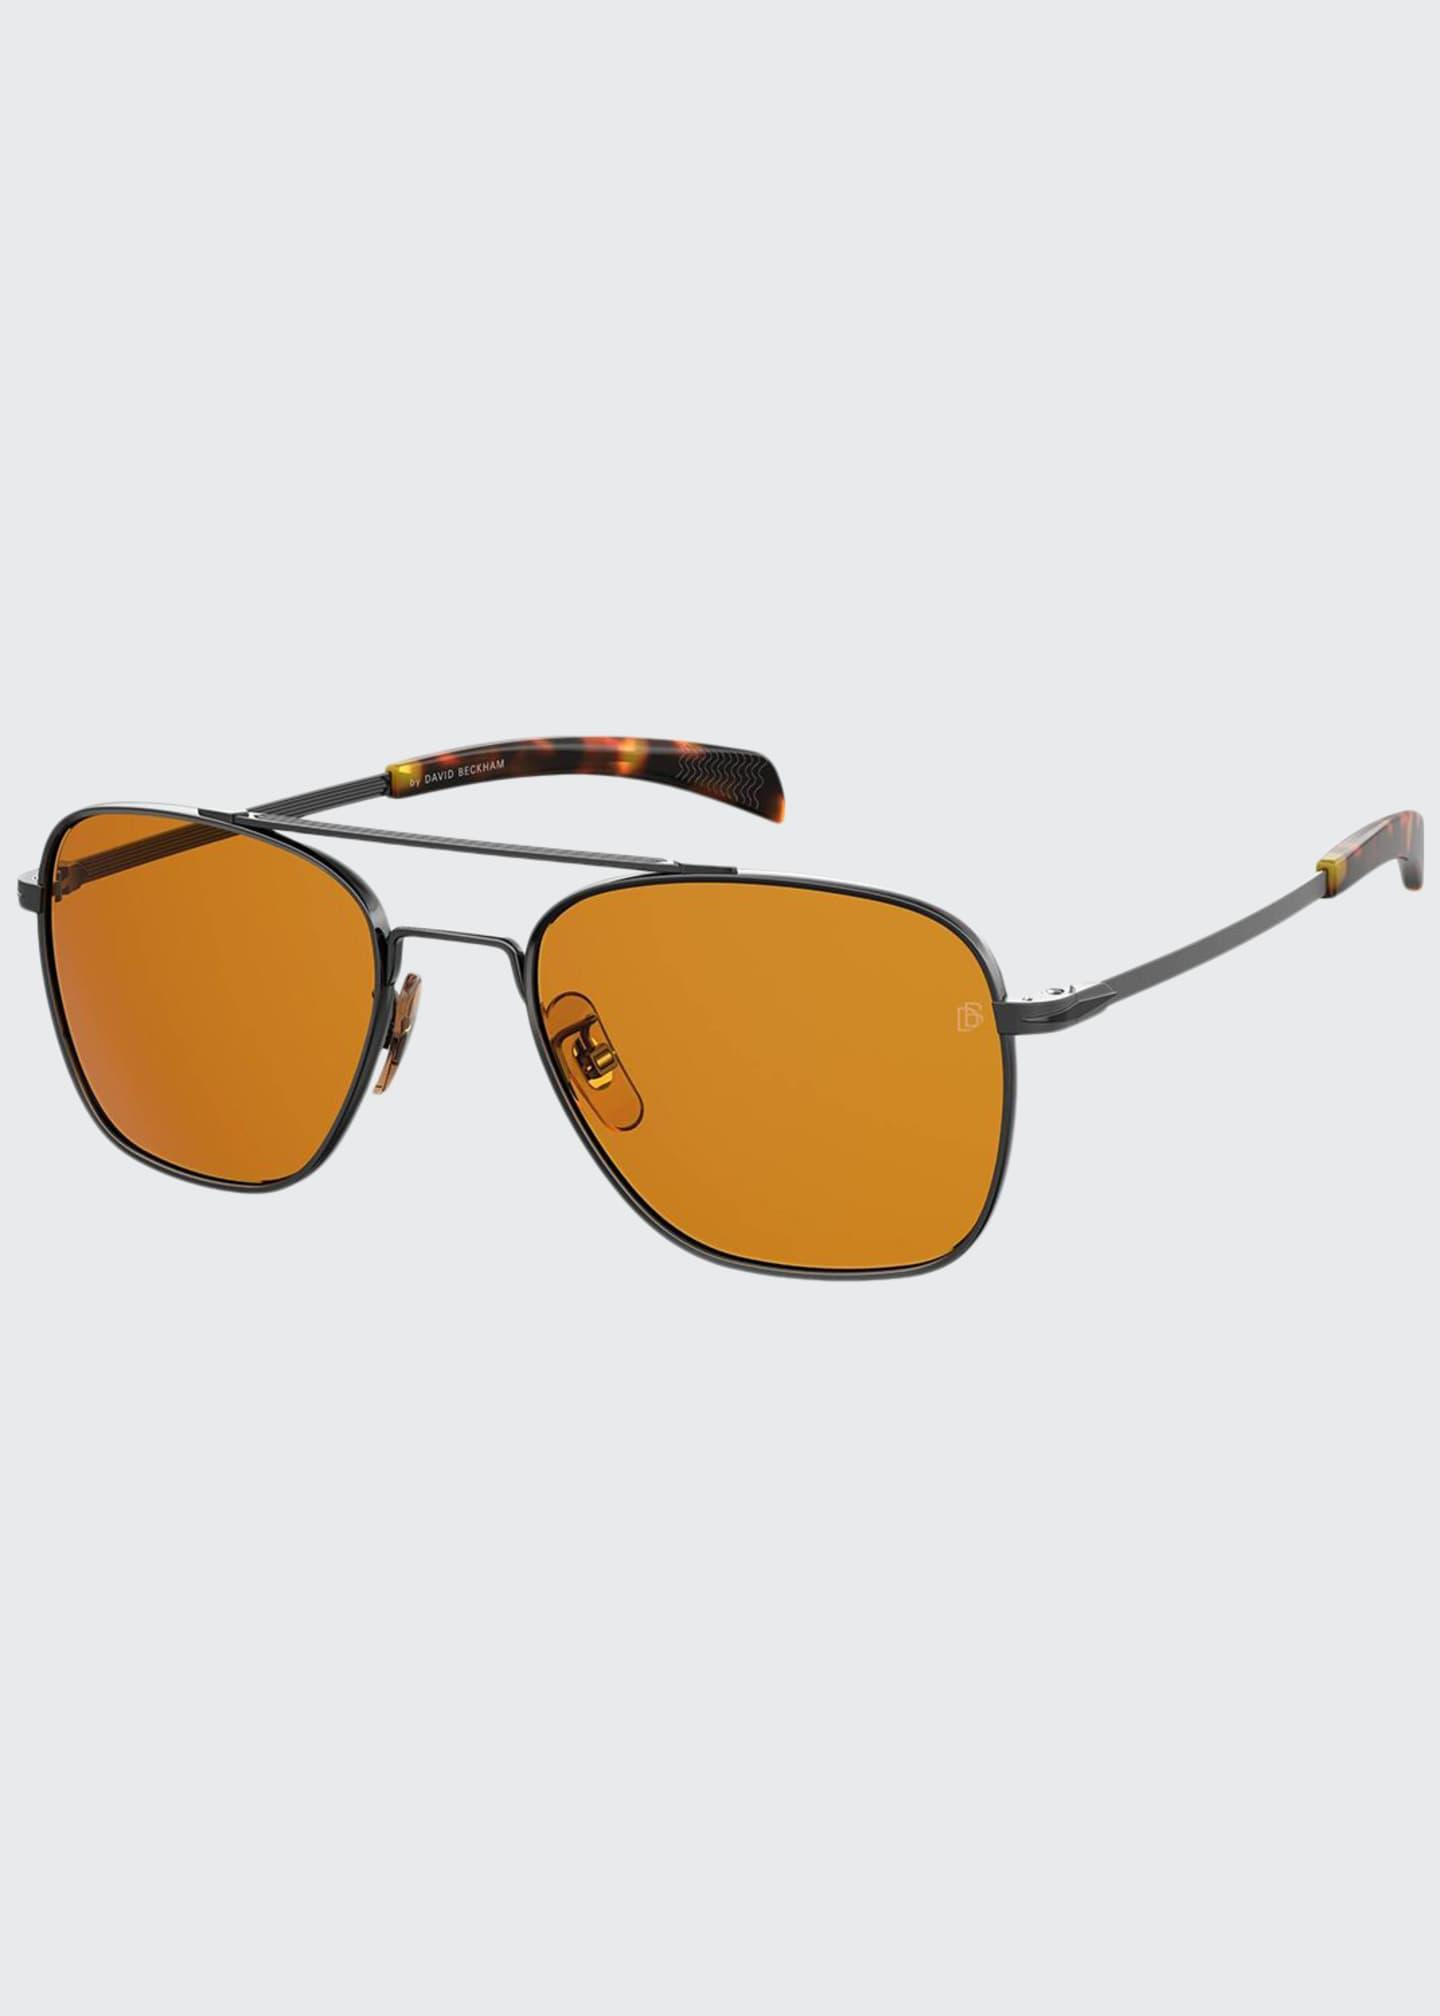 David Beckham Men's Square Metal Double-Bridge Sunglasses